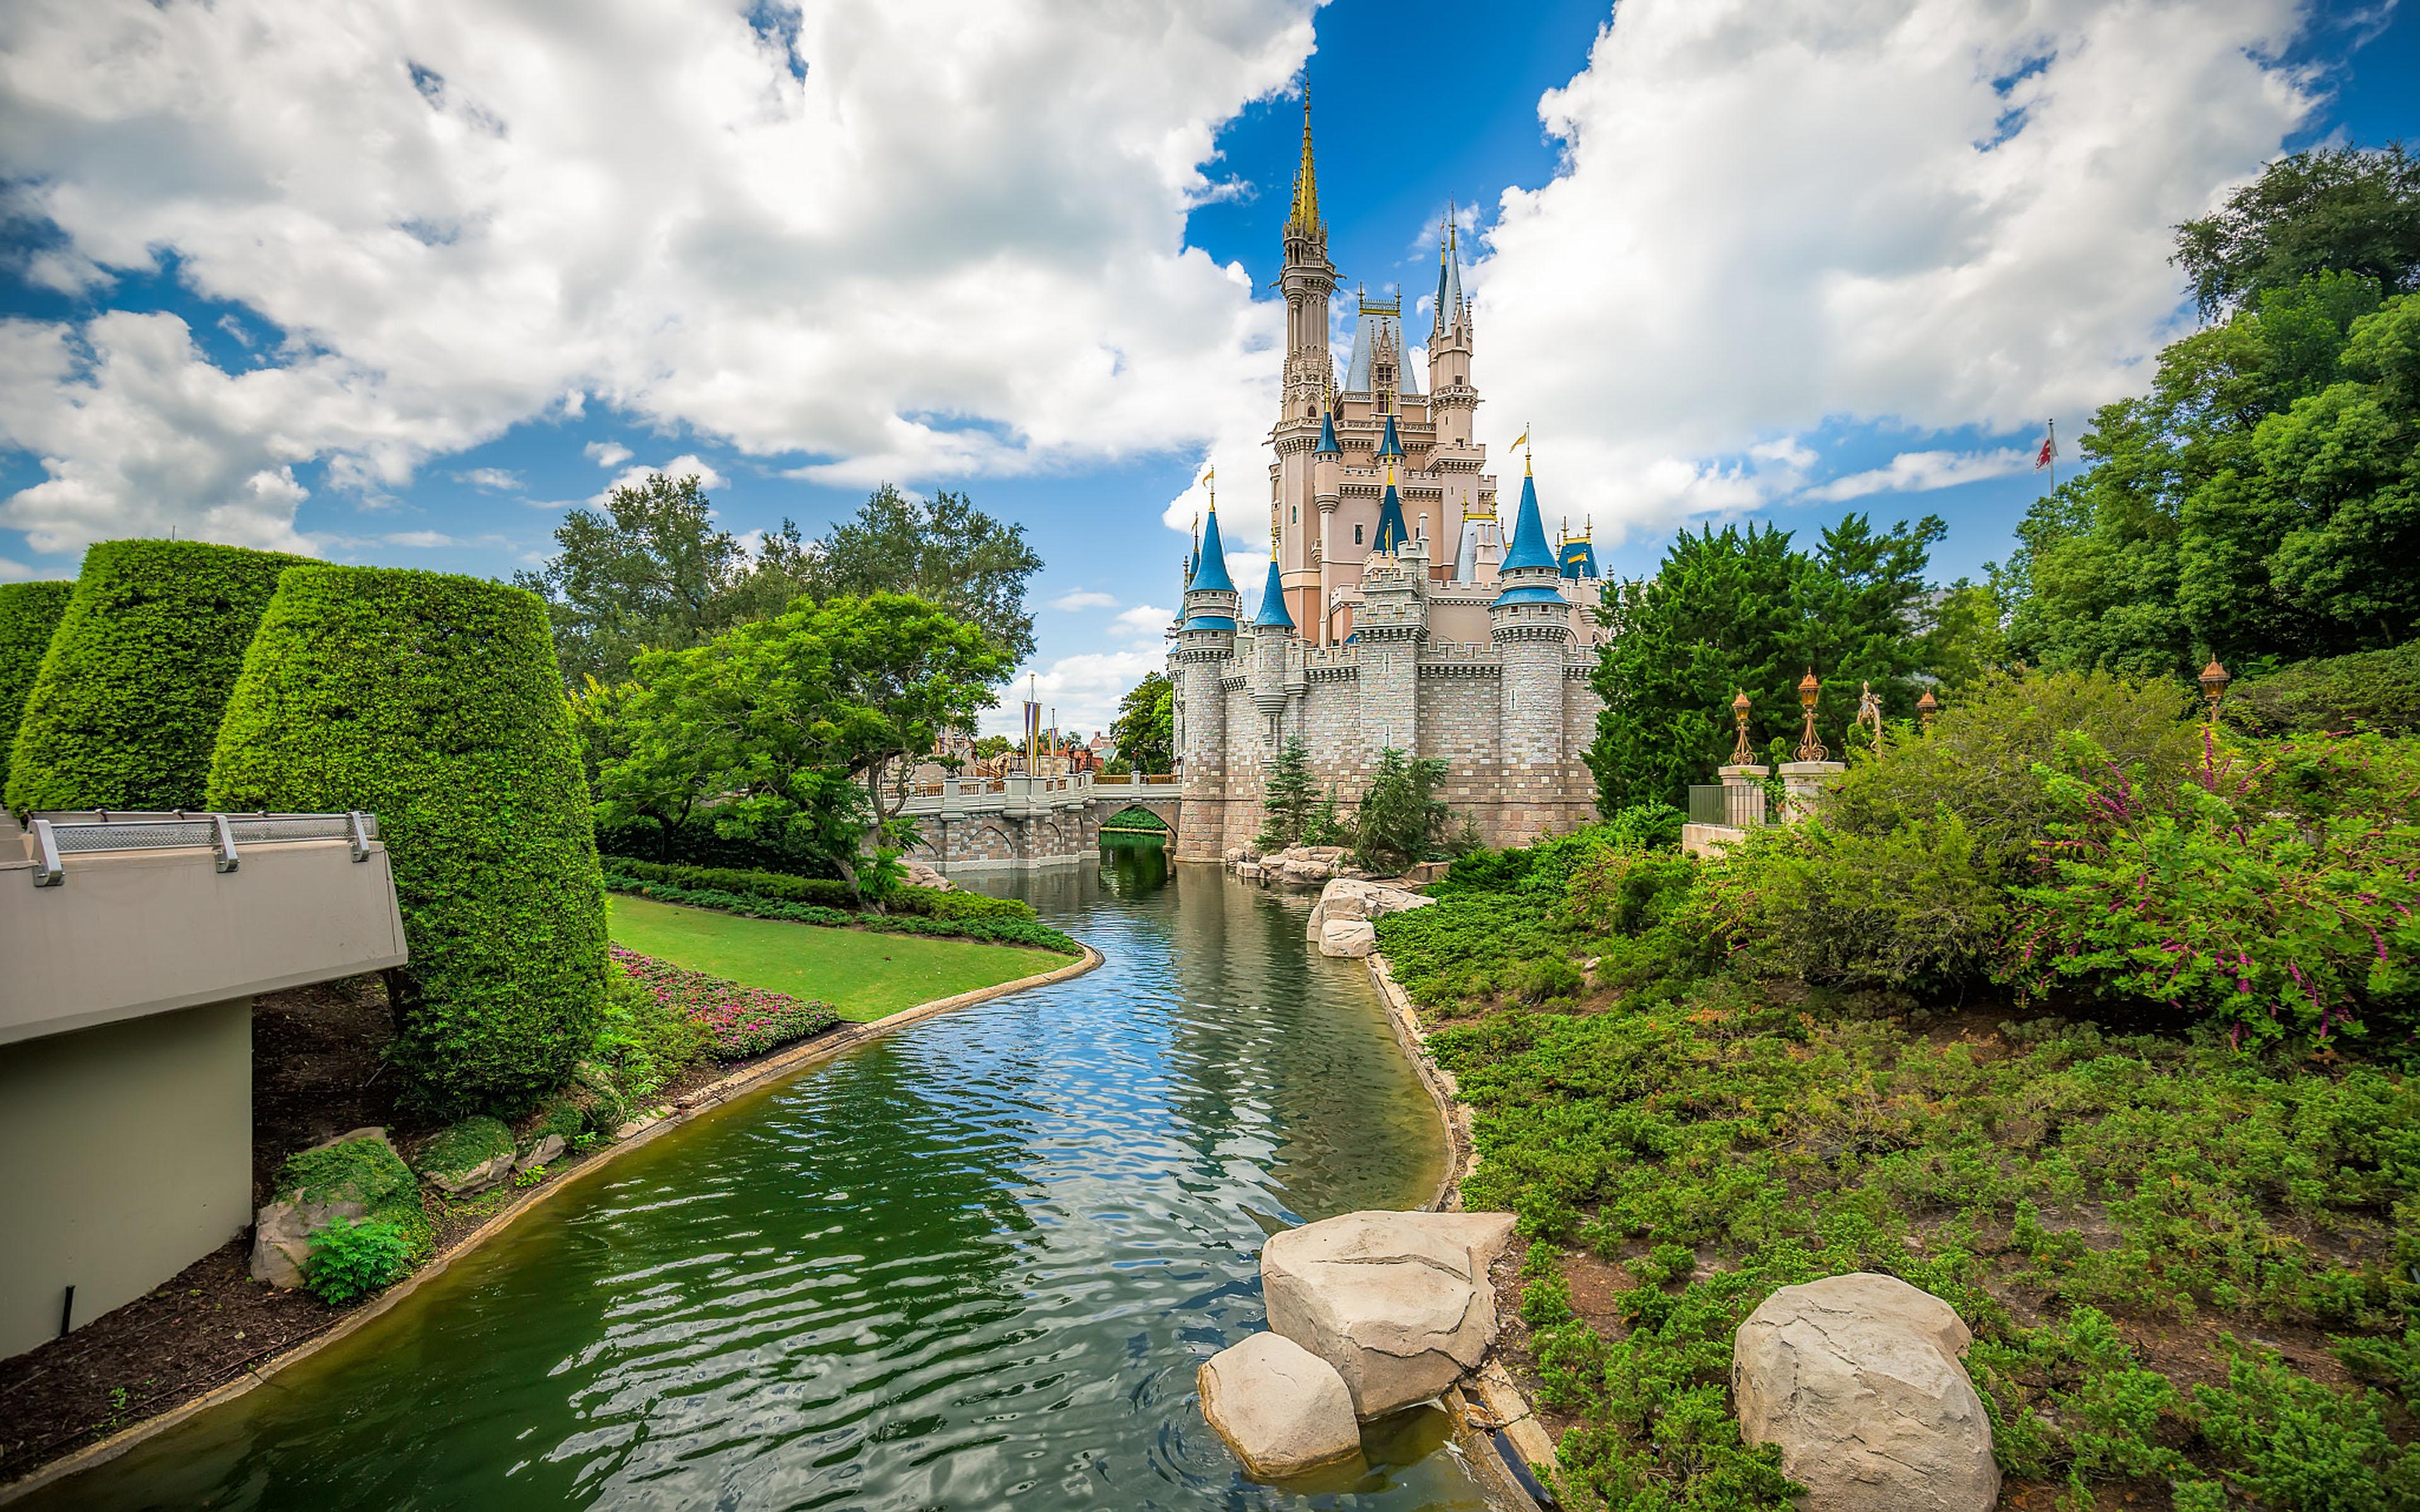 3d Art Ultra Hd Wallpapers Cinderella S Castle In Disneyworld Orlando Usa 4k Ultra Hd